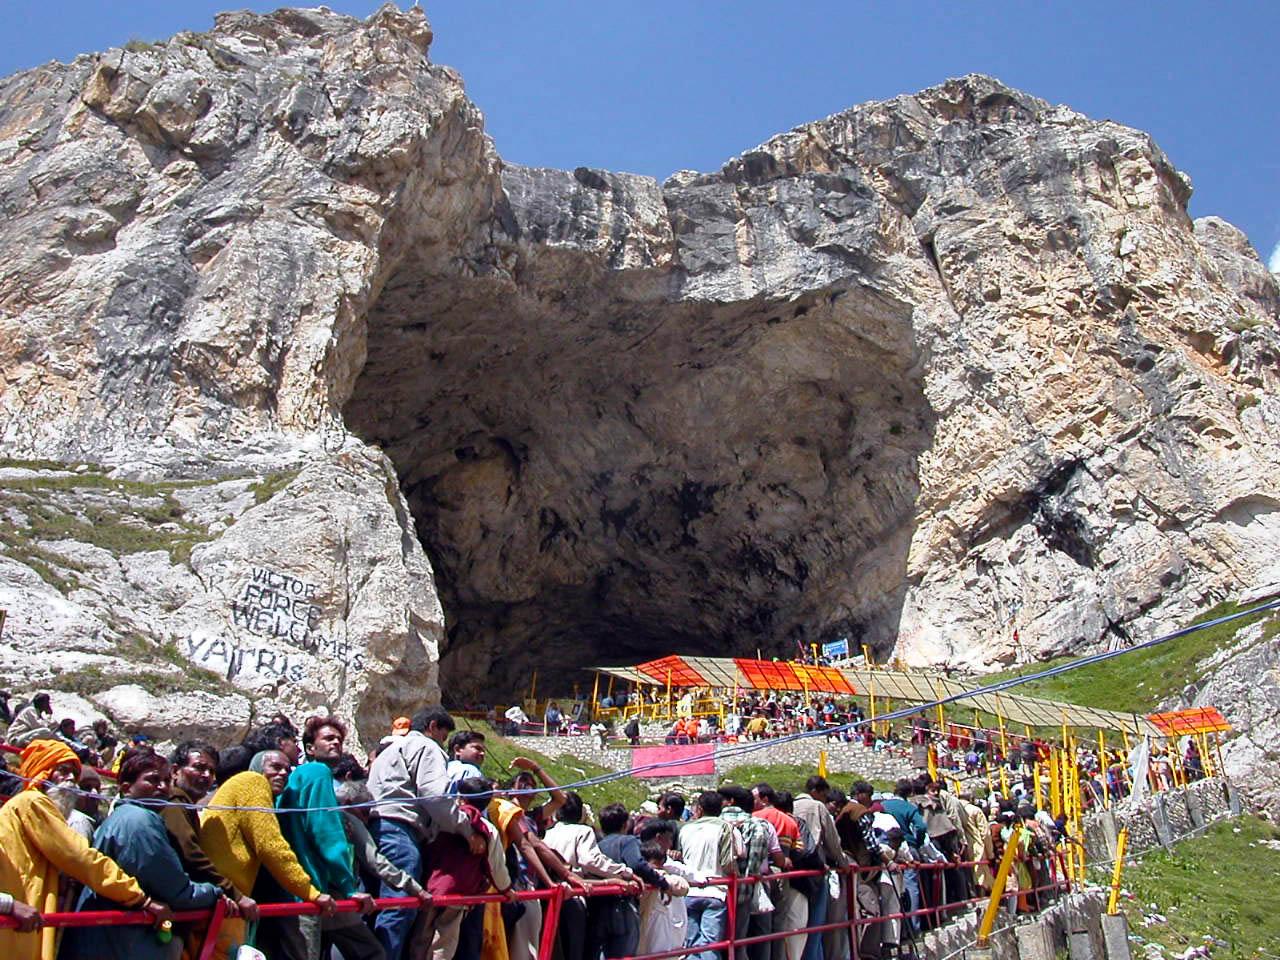 Amarnath Yatra: North India Pilgrimage Tour